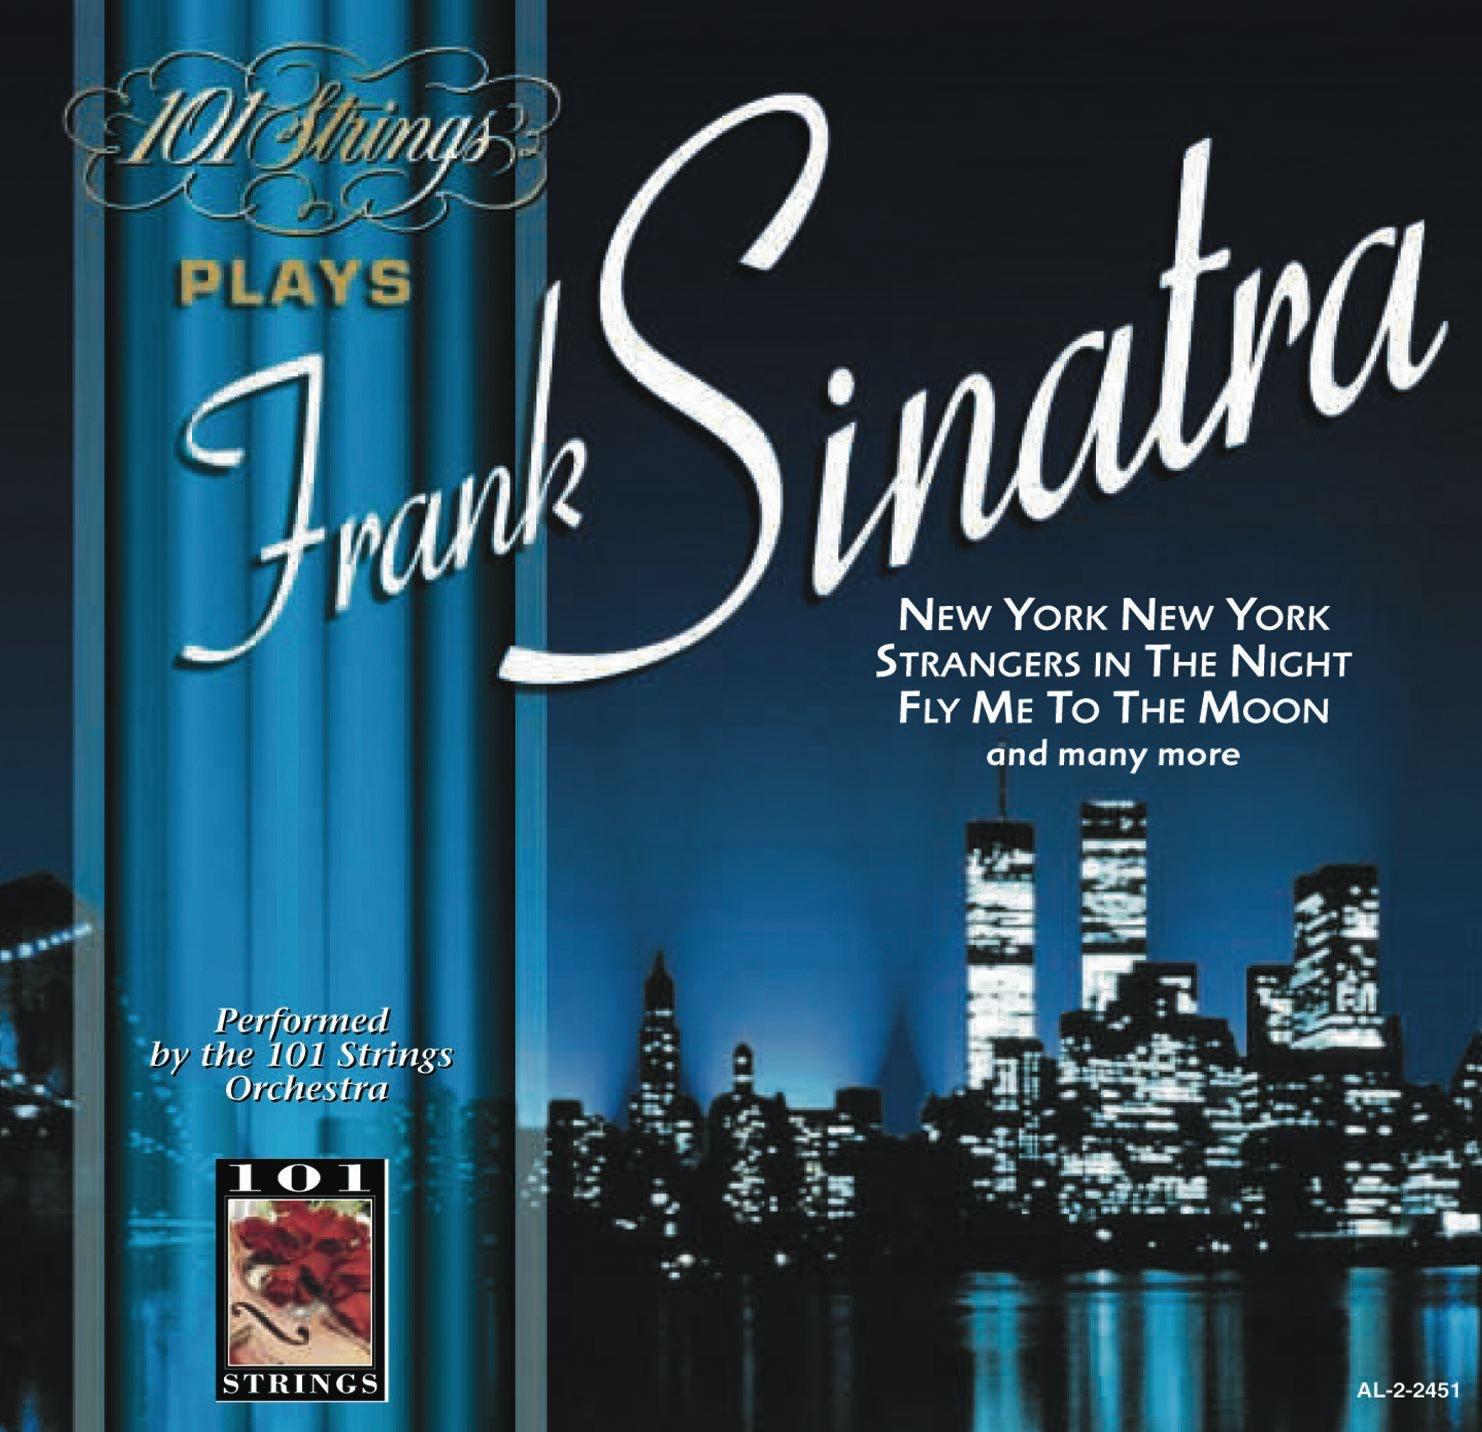 frank sinatra strangers in the night album